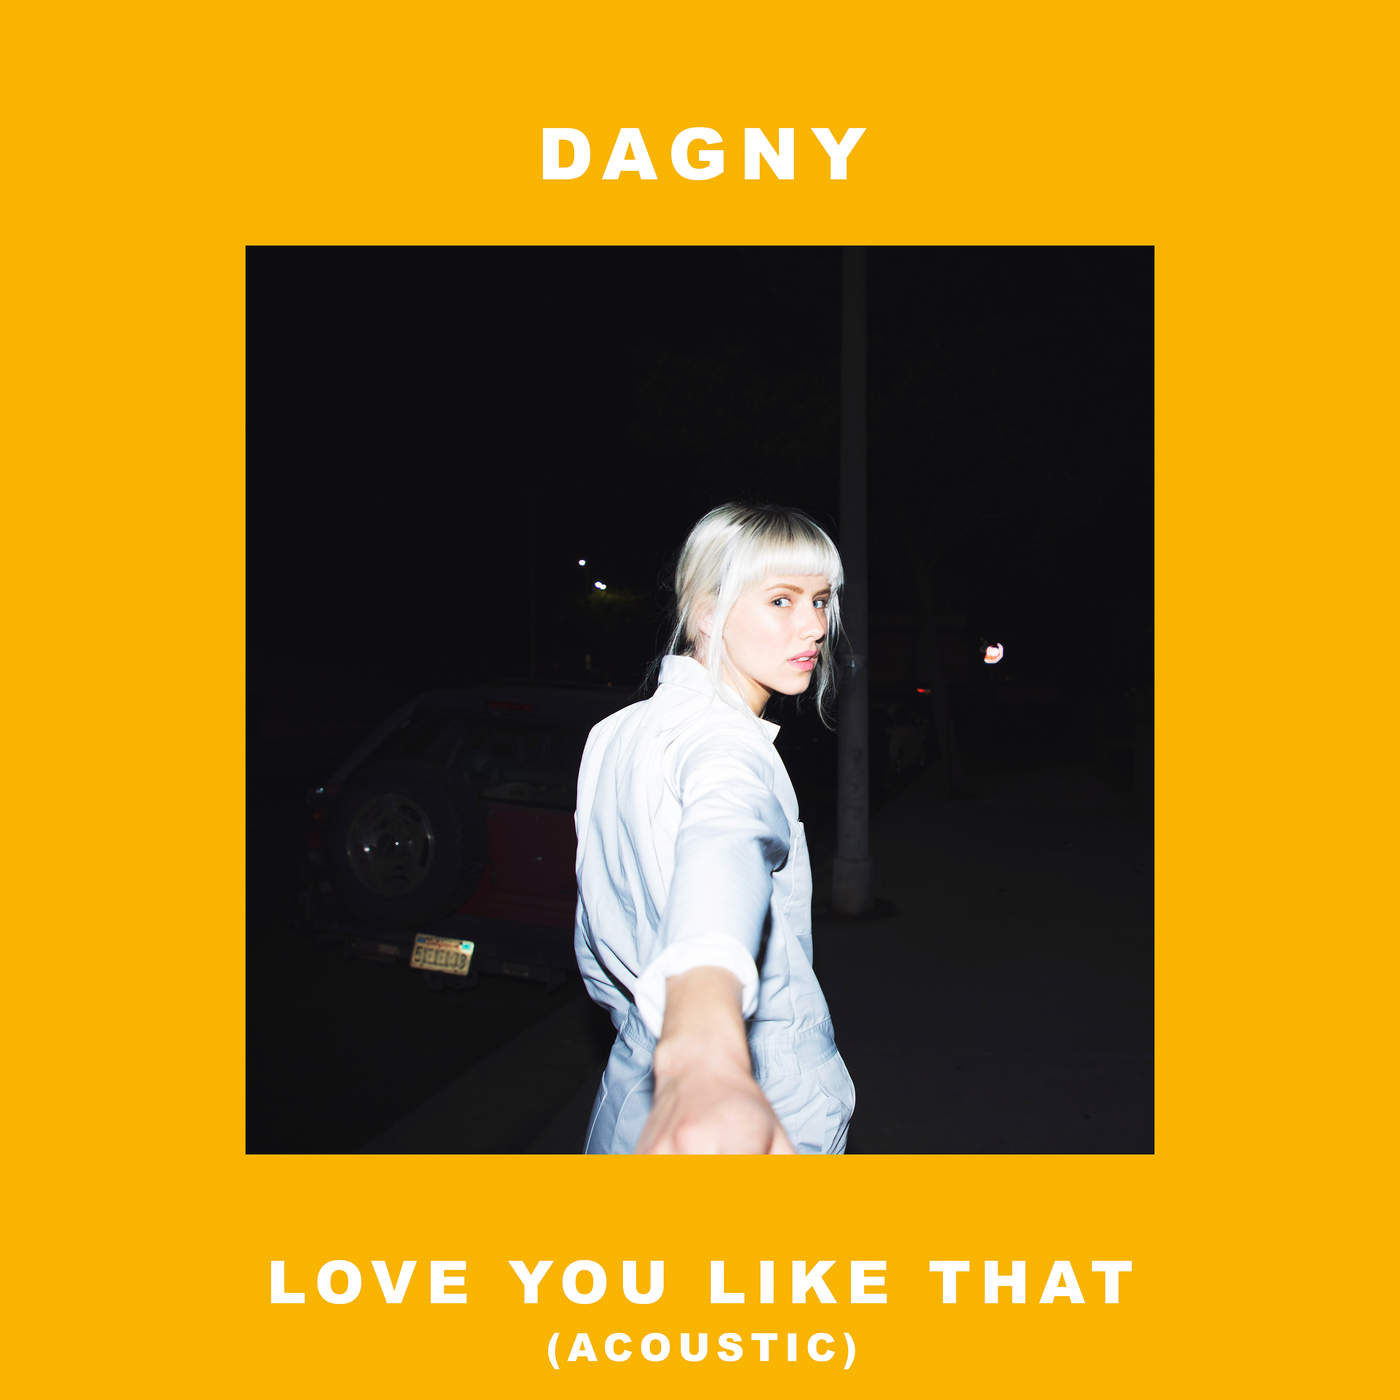 Dagny - Love You Like That (Acoustic) - Single